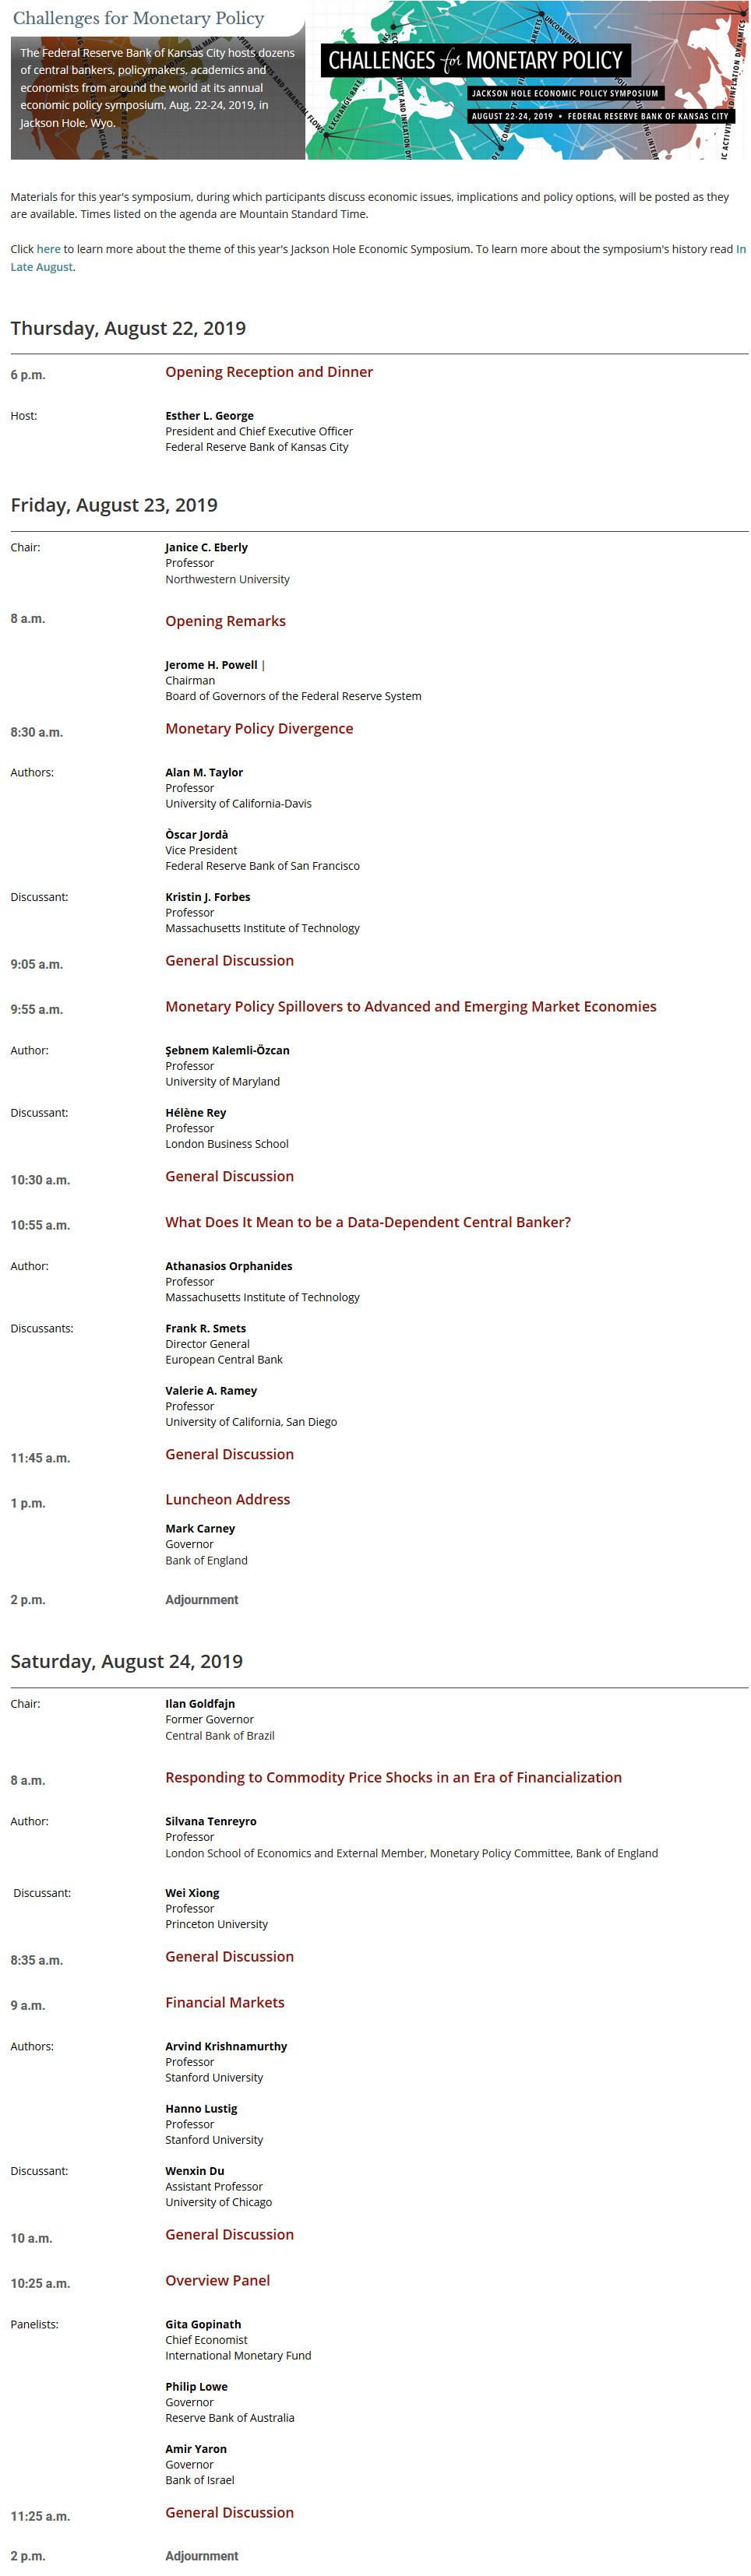 Agenda sympozjum w Jackosn Hole